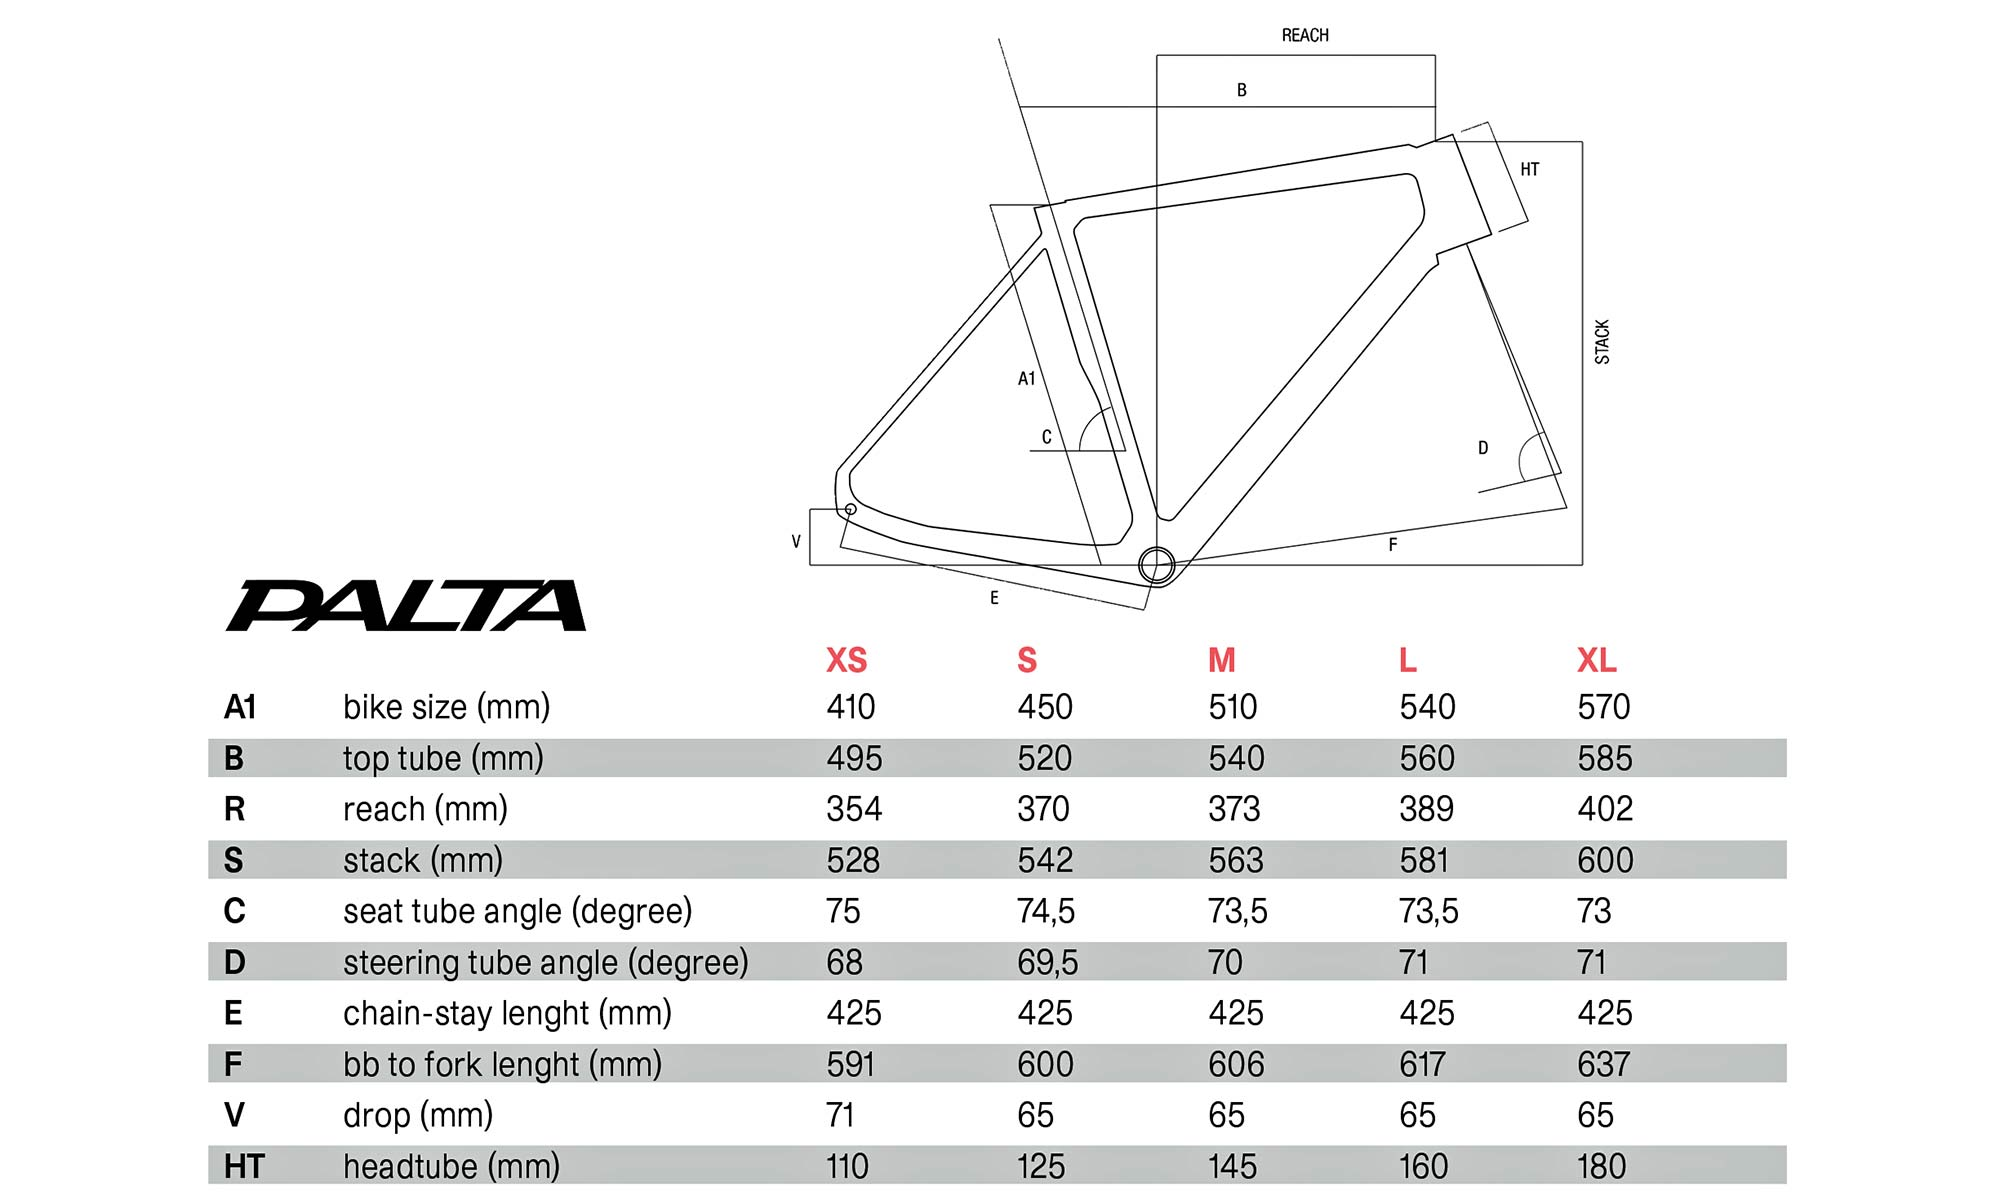 2022 Basso Palta II carbon gravel bike review made-in-Italy, photo by Francesco Bonato,adventure gravel geometry